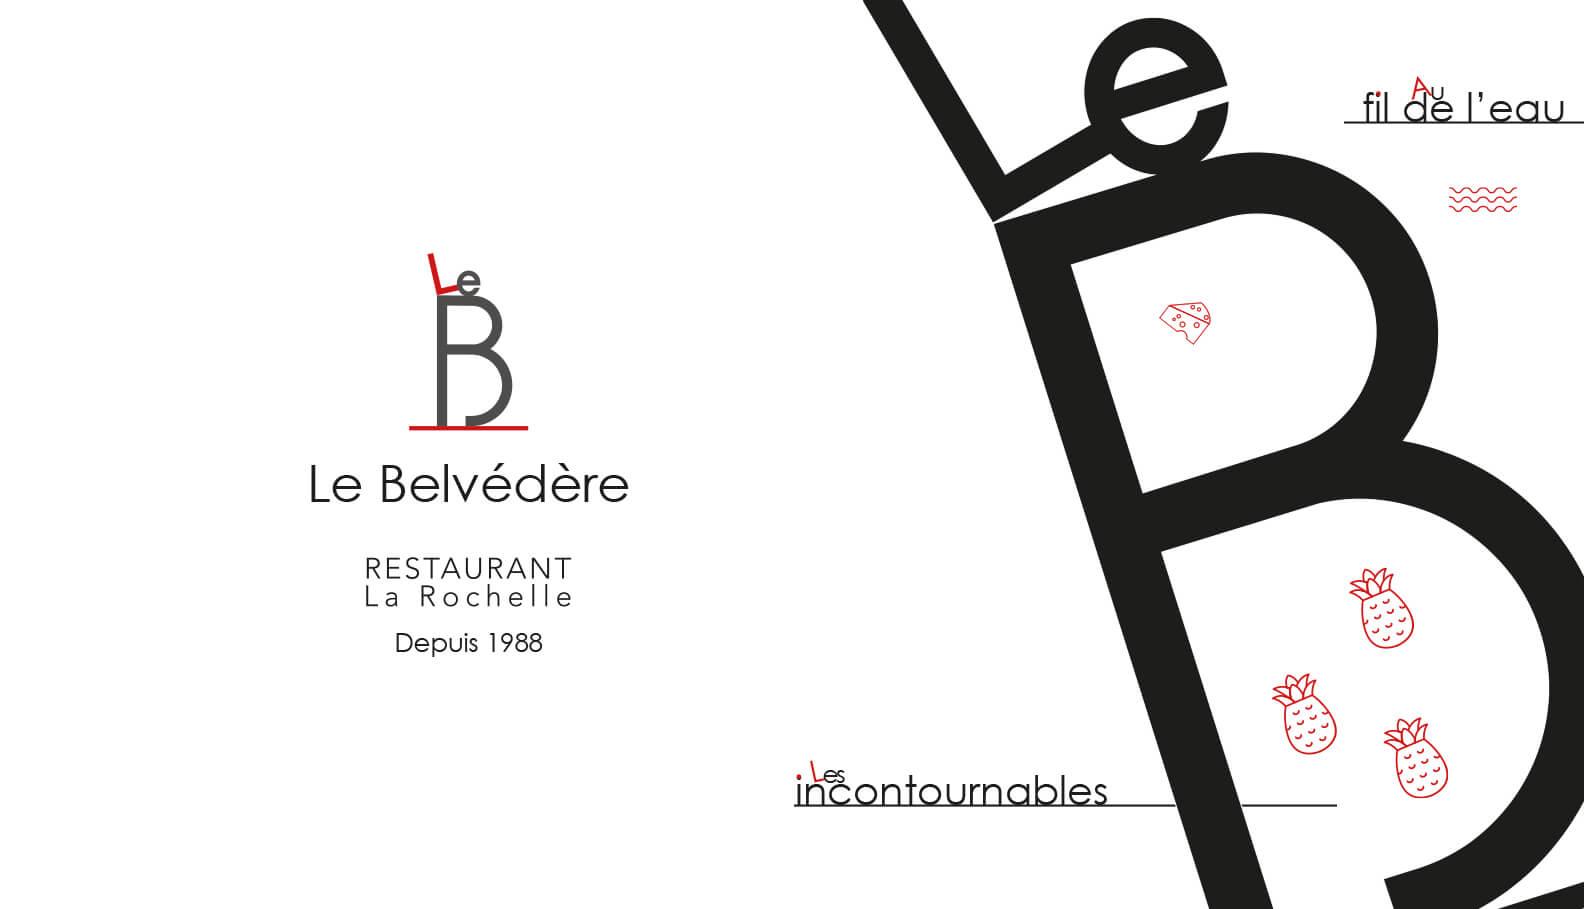 Le-Belvedere-La-Rochelle